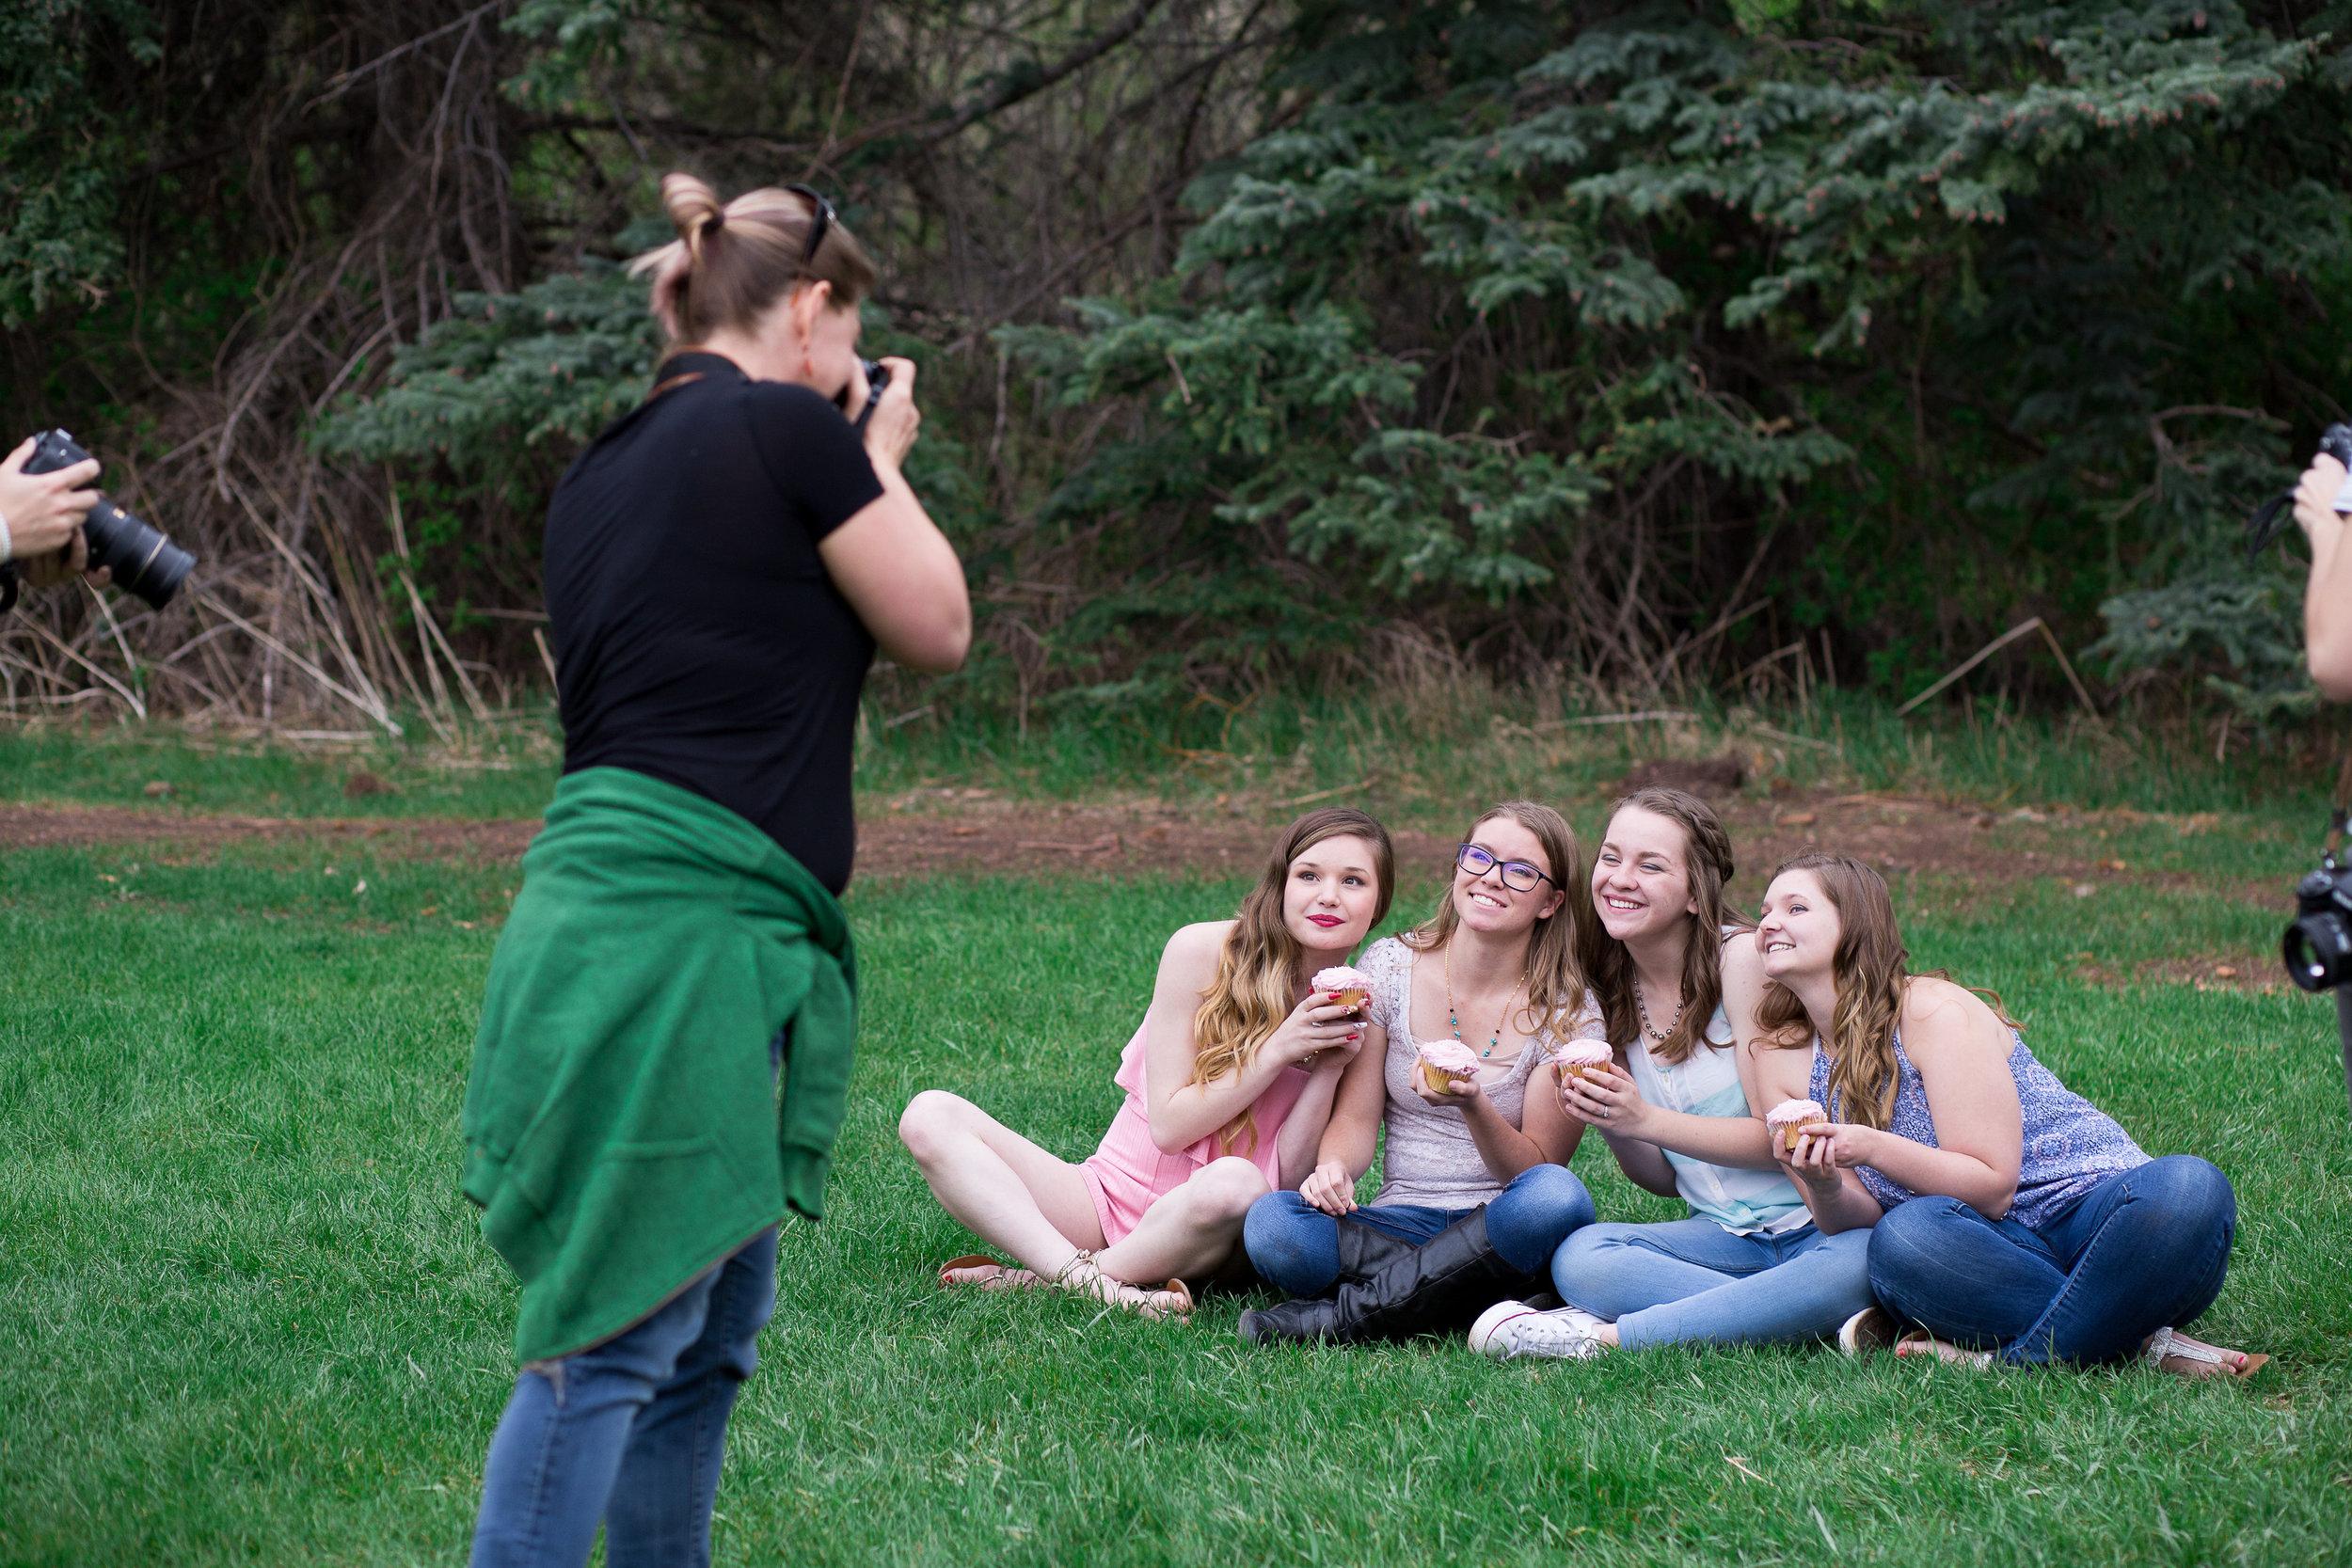 Colorado Springs Senior Portrait Photographer | Stacy Carosa Photography | Colorado Springs Senior Photography | Colorado Springs Friends Photo Session